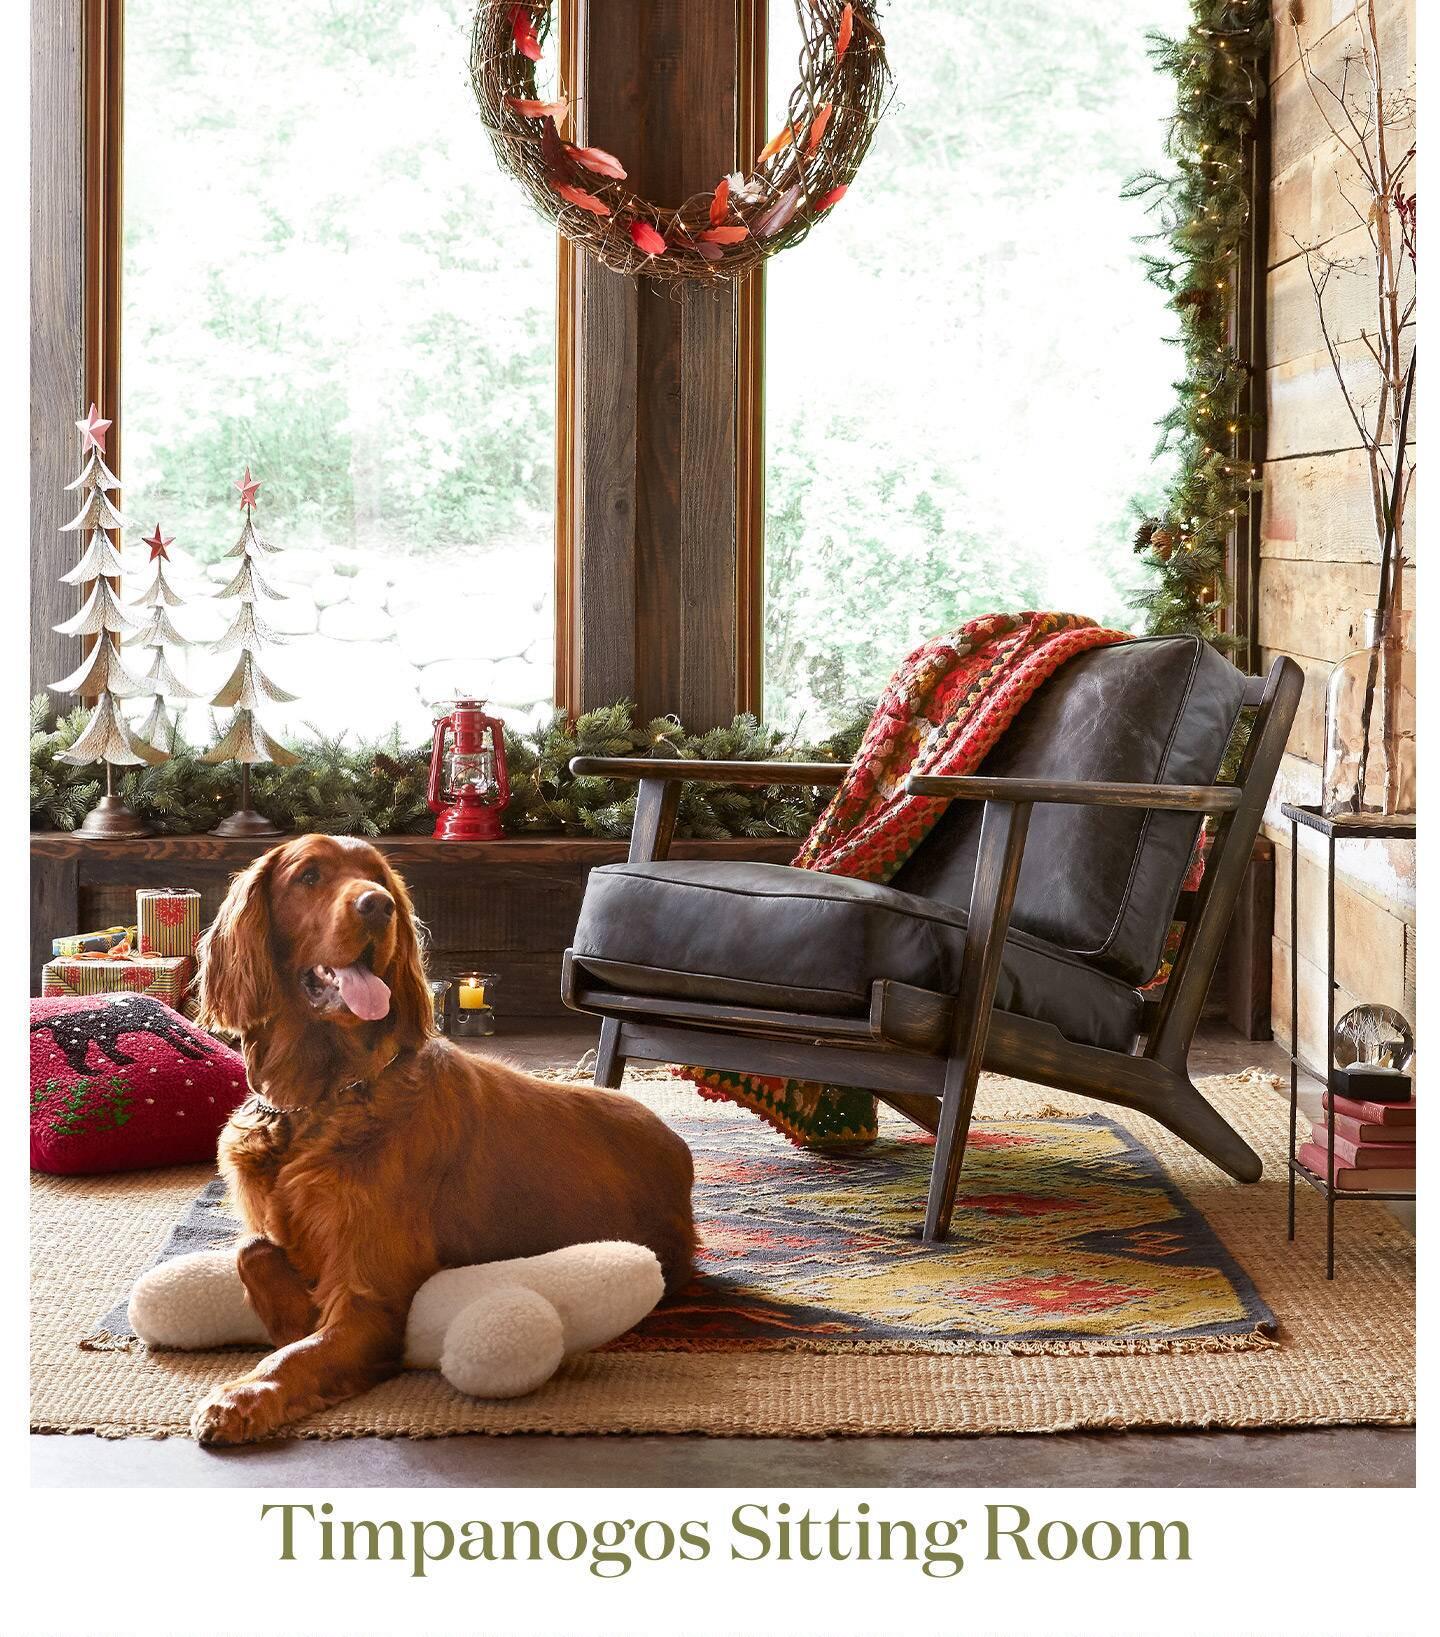 Timpanogos Sitting Room